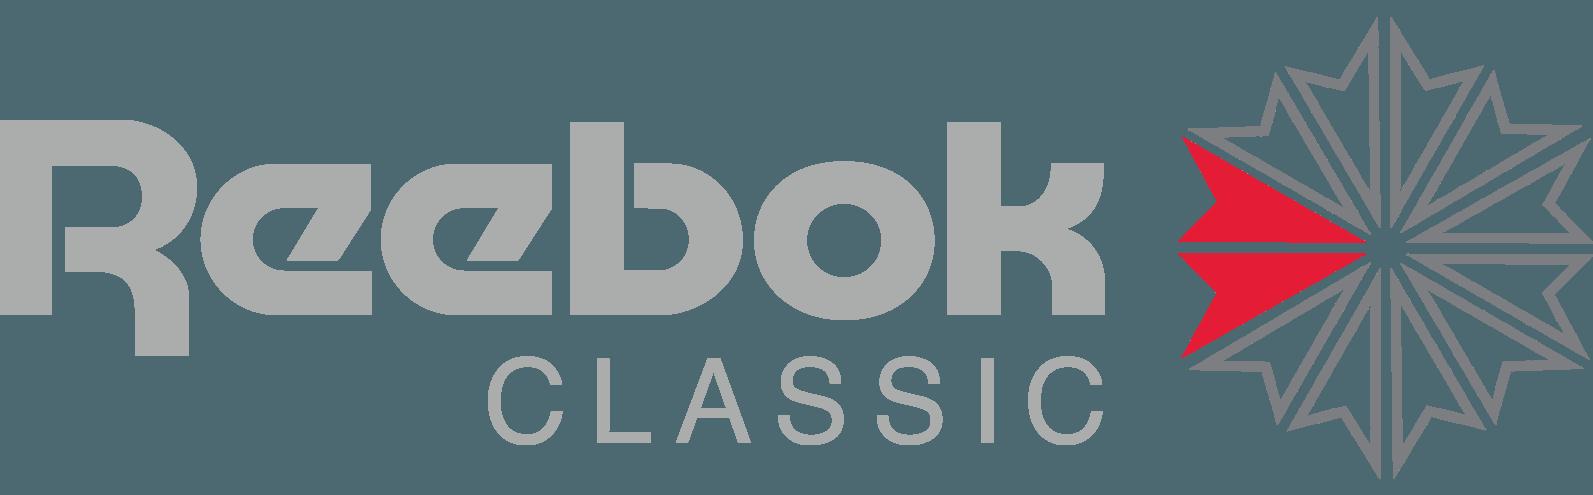 reebok-classic catalog